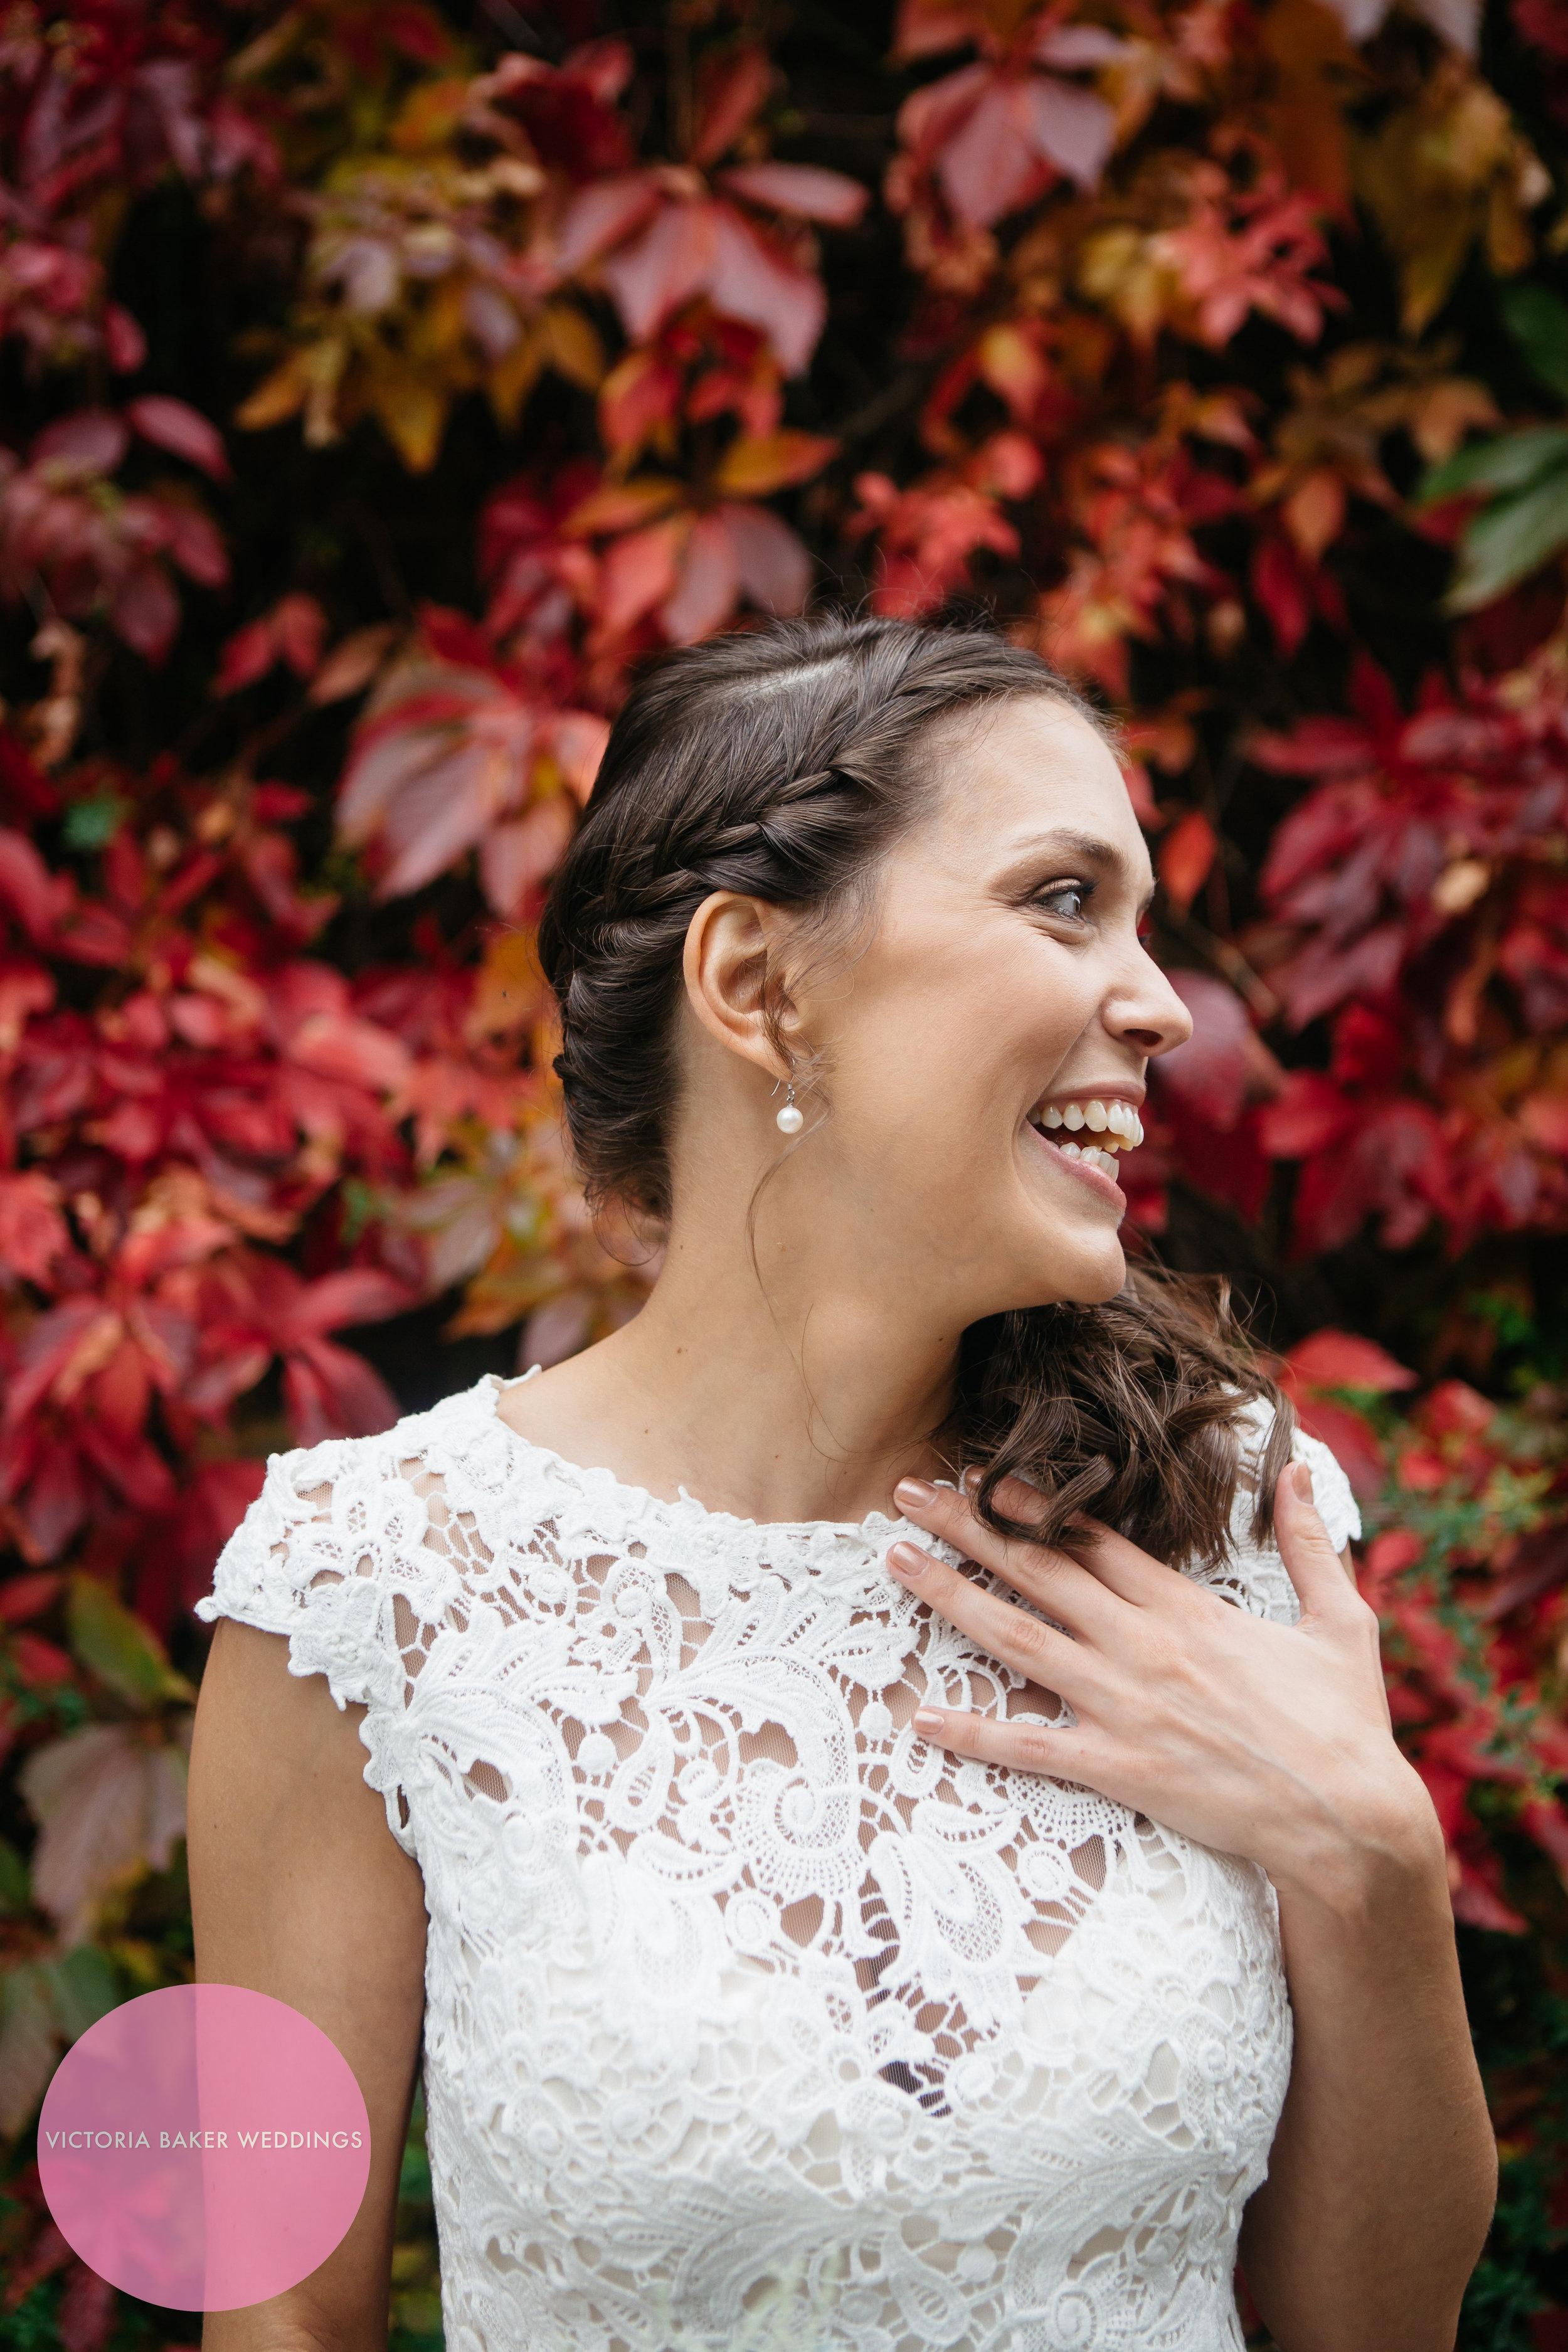 Best Wedding Photographs 2016 - Gorgeous bride Jenna